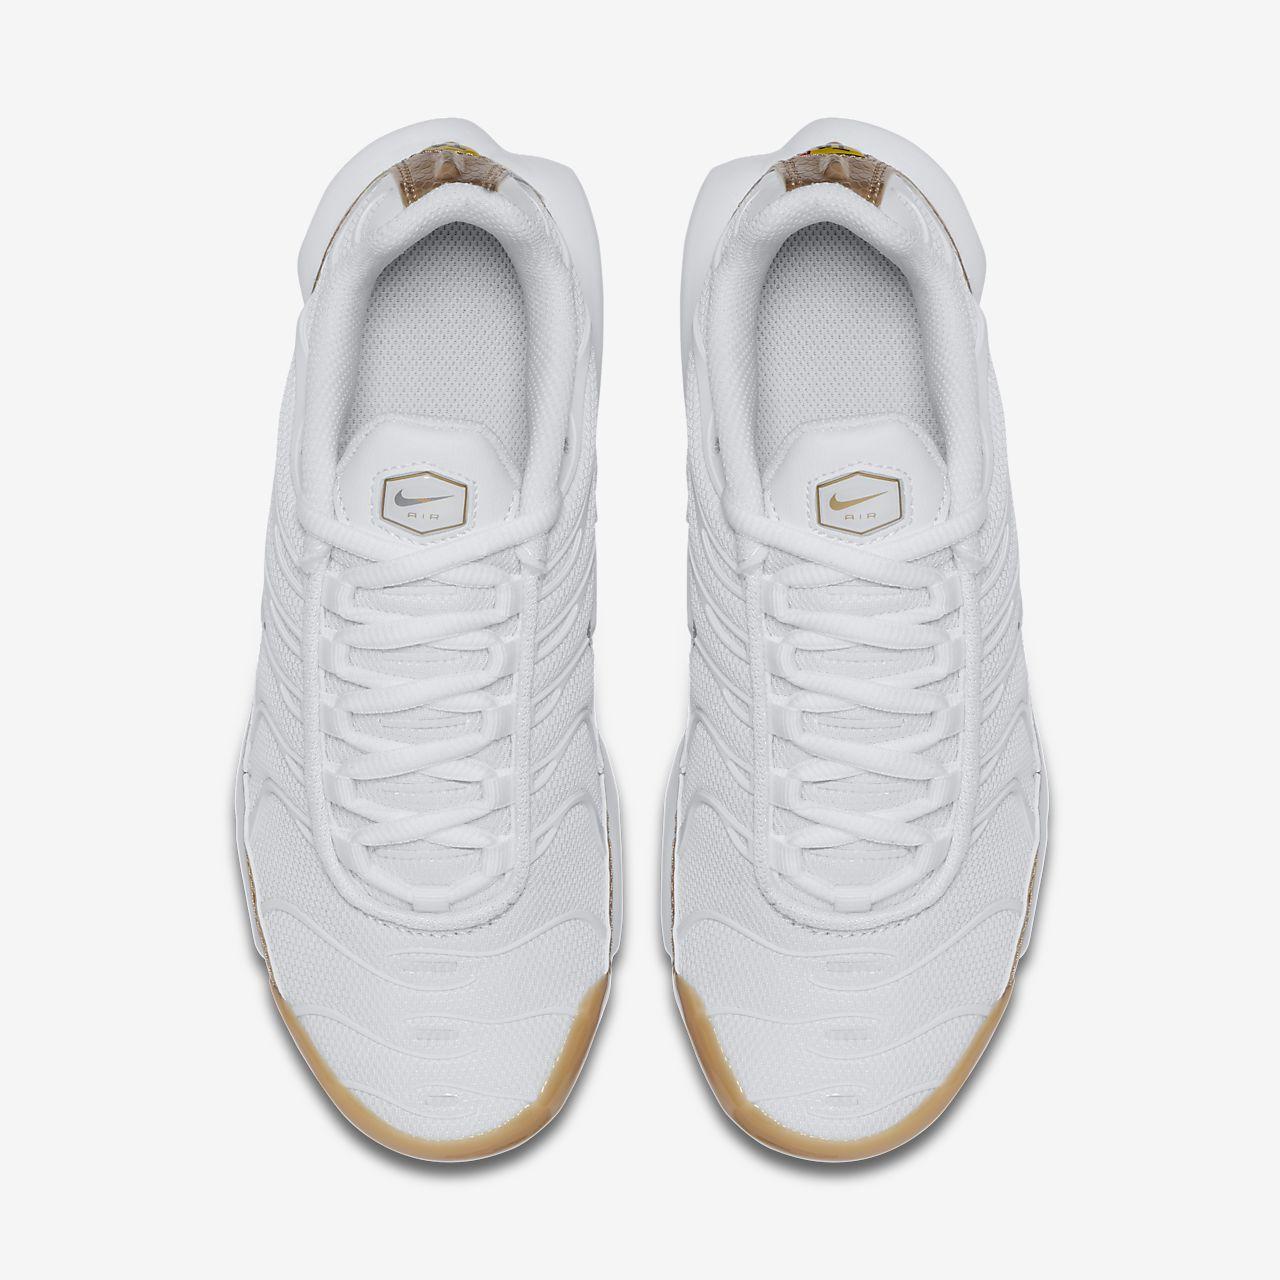 33f8d85f78 Nike Air Max Plus EP Older Kids' Shoe. Nike.com ZA